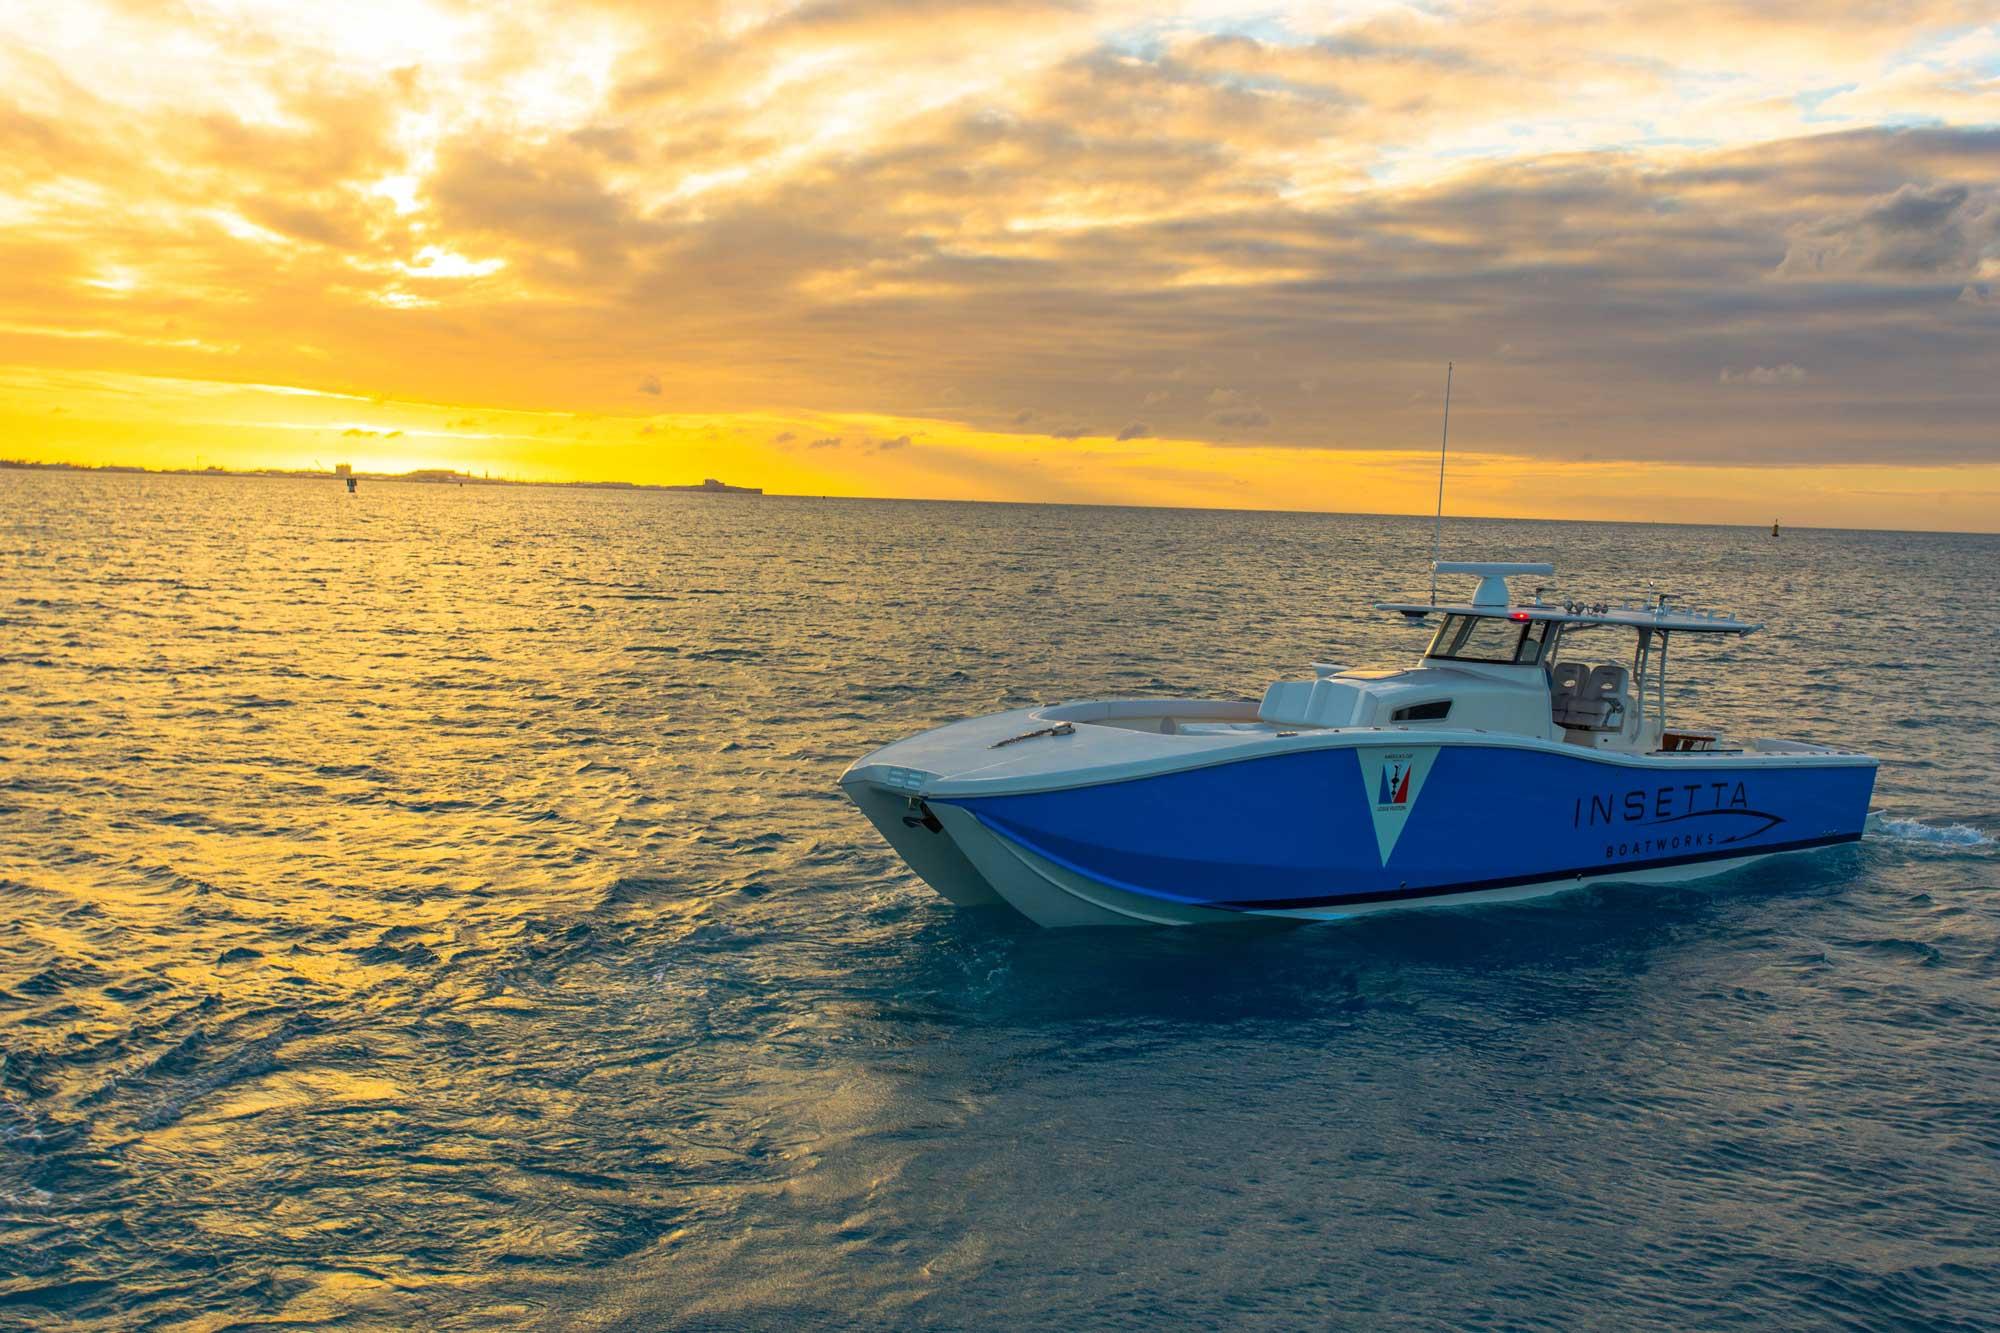 insetta-boat-bermuda-golden-sunset